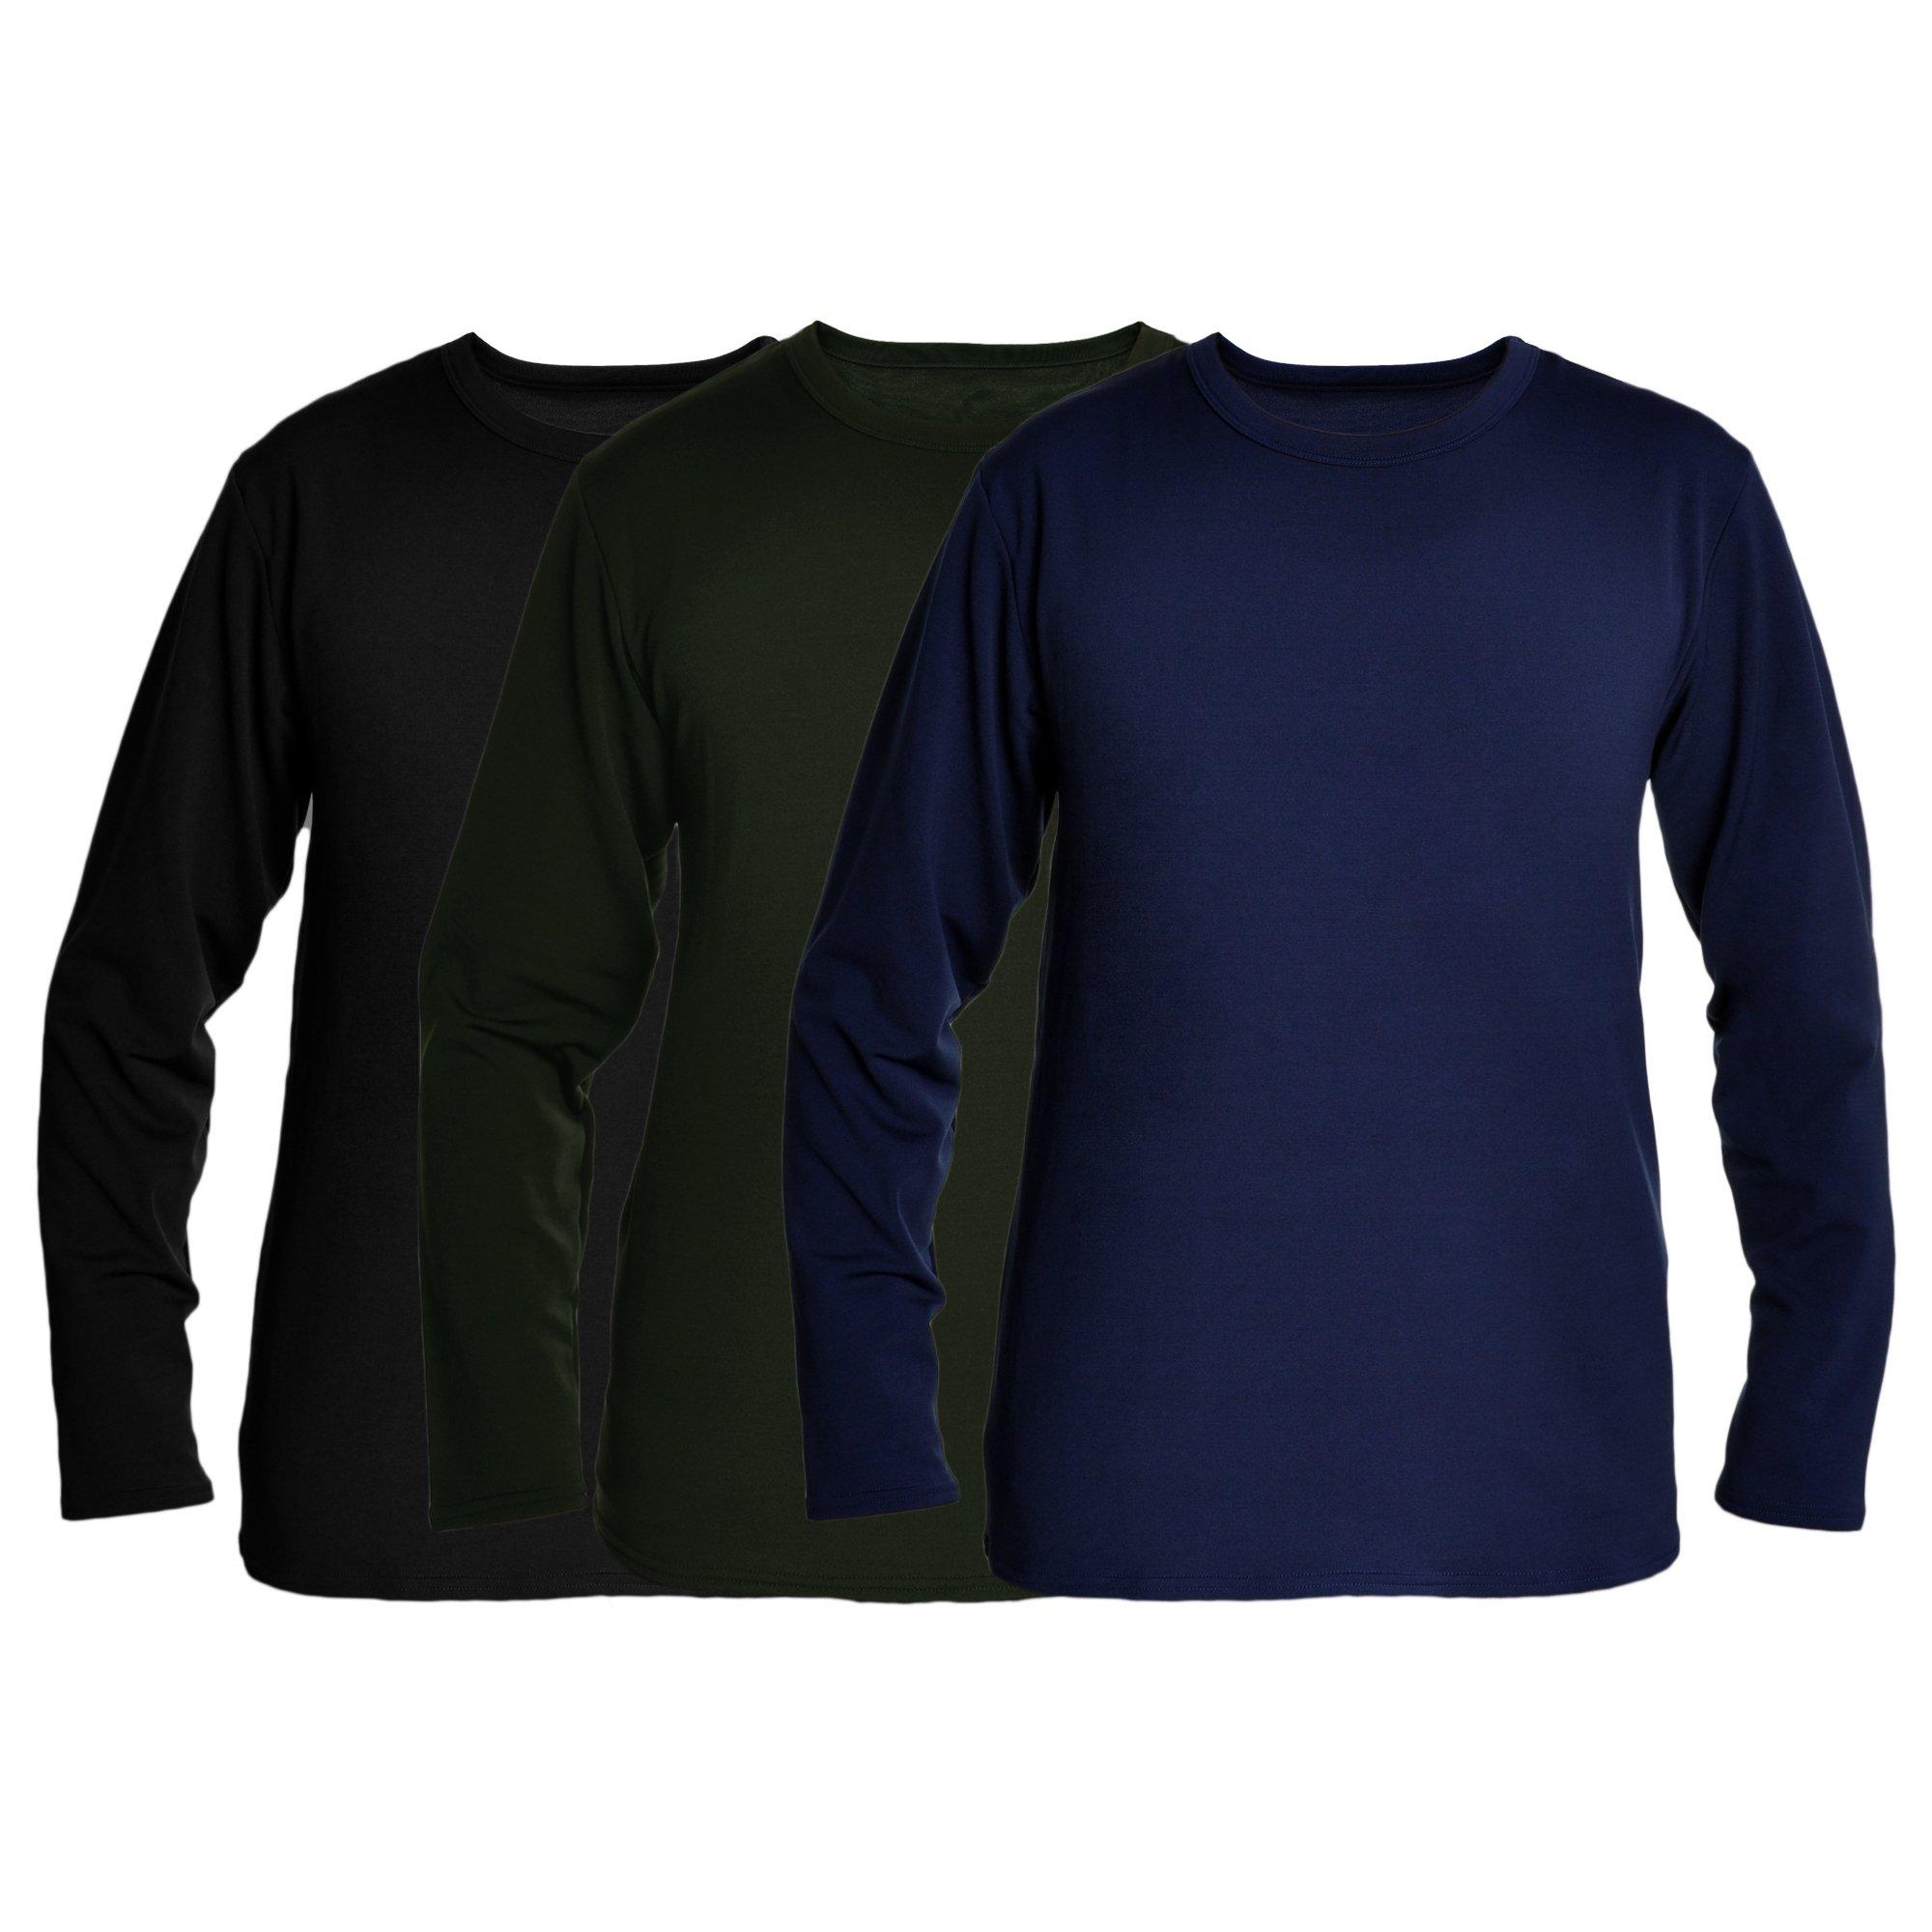 Swan Men's Fleece-Lined Long-Sleeve Thermal Tops #8915_D-BGN_M